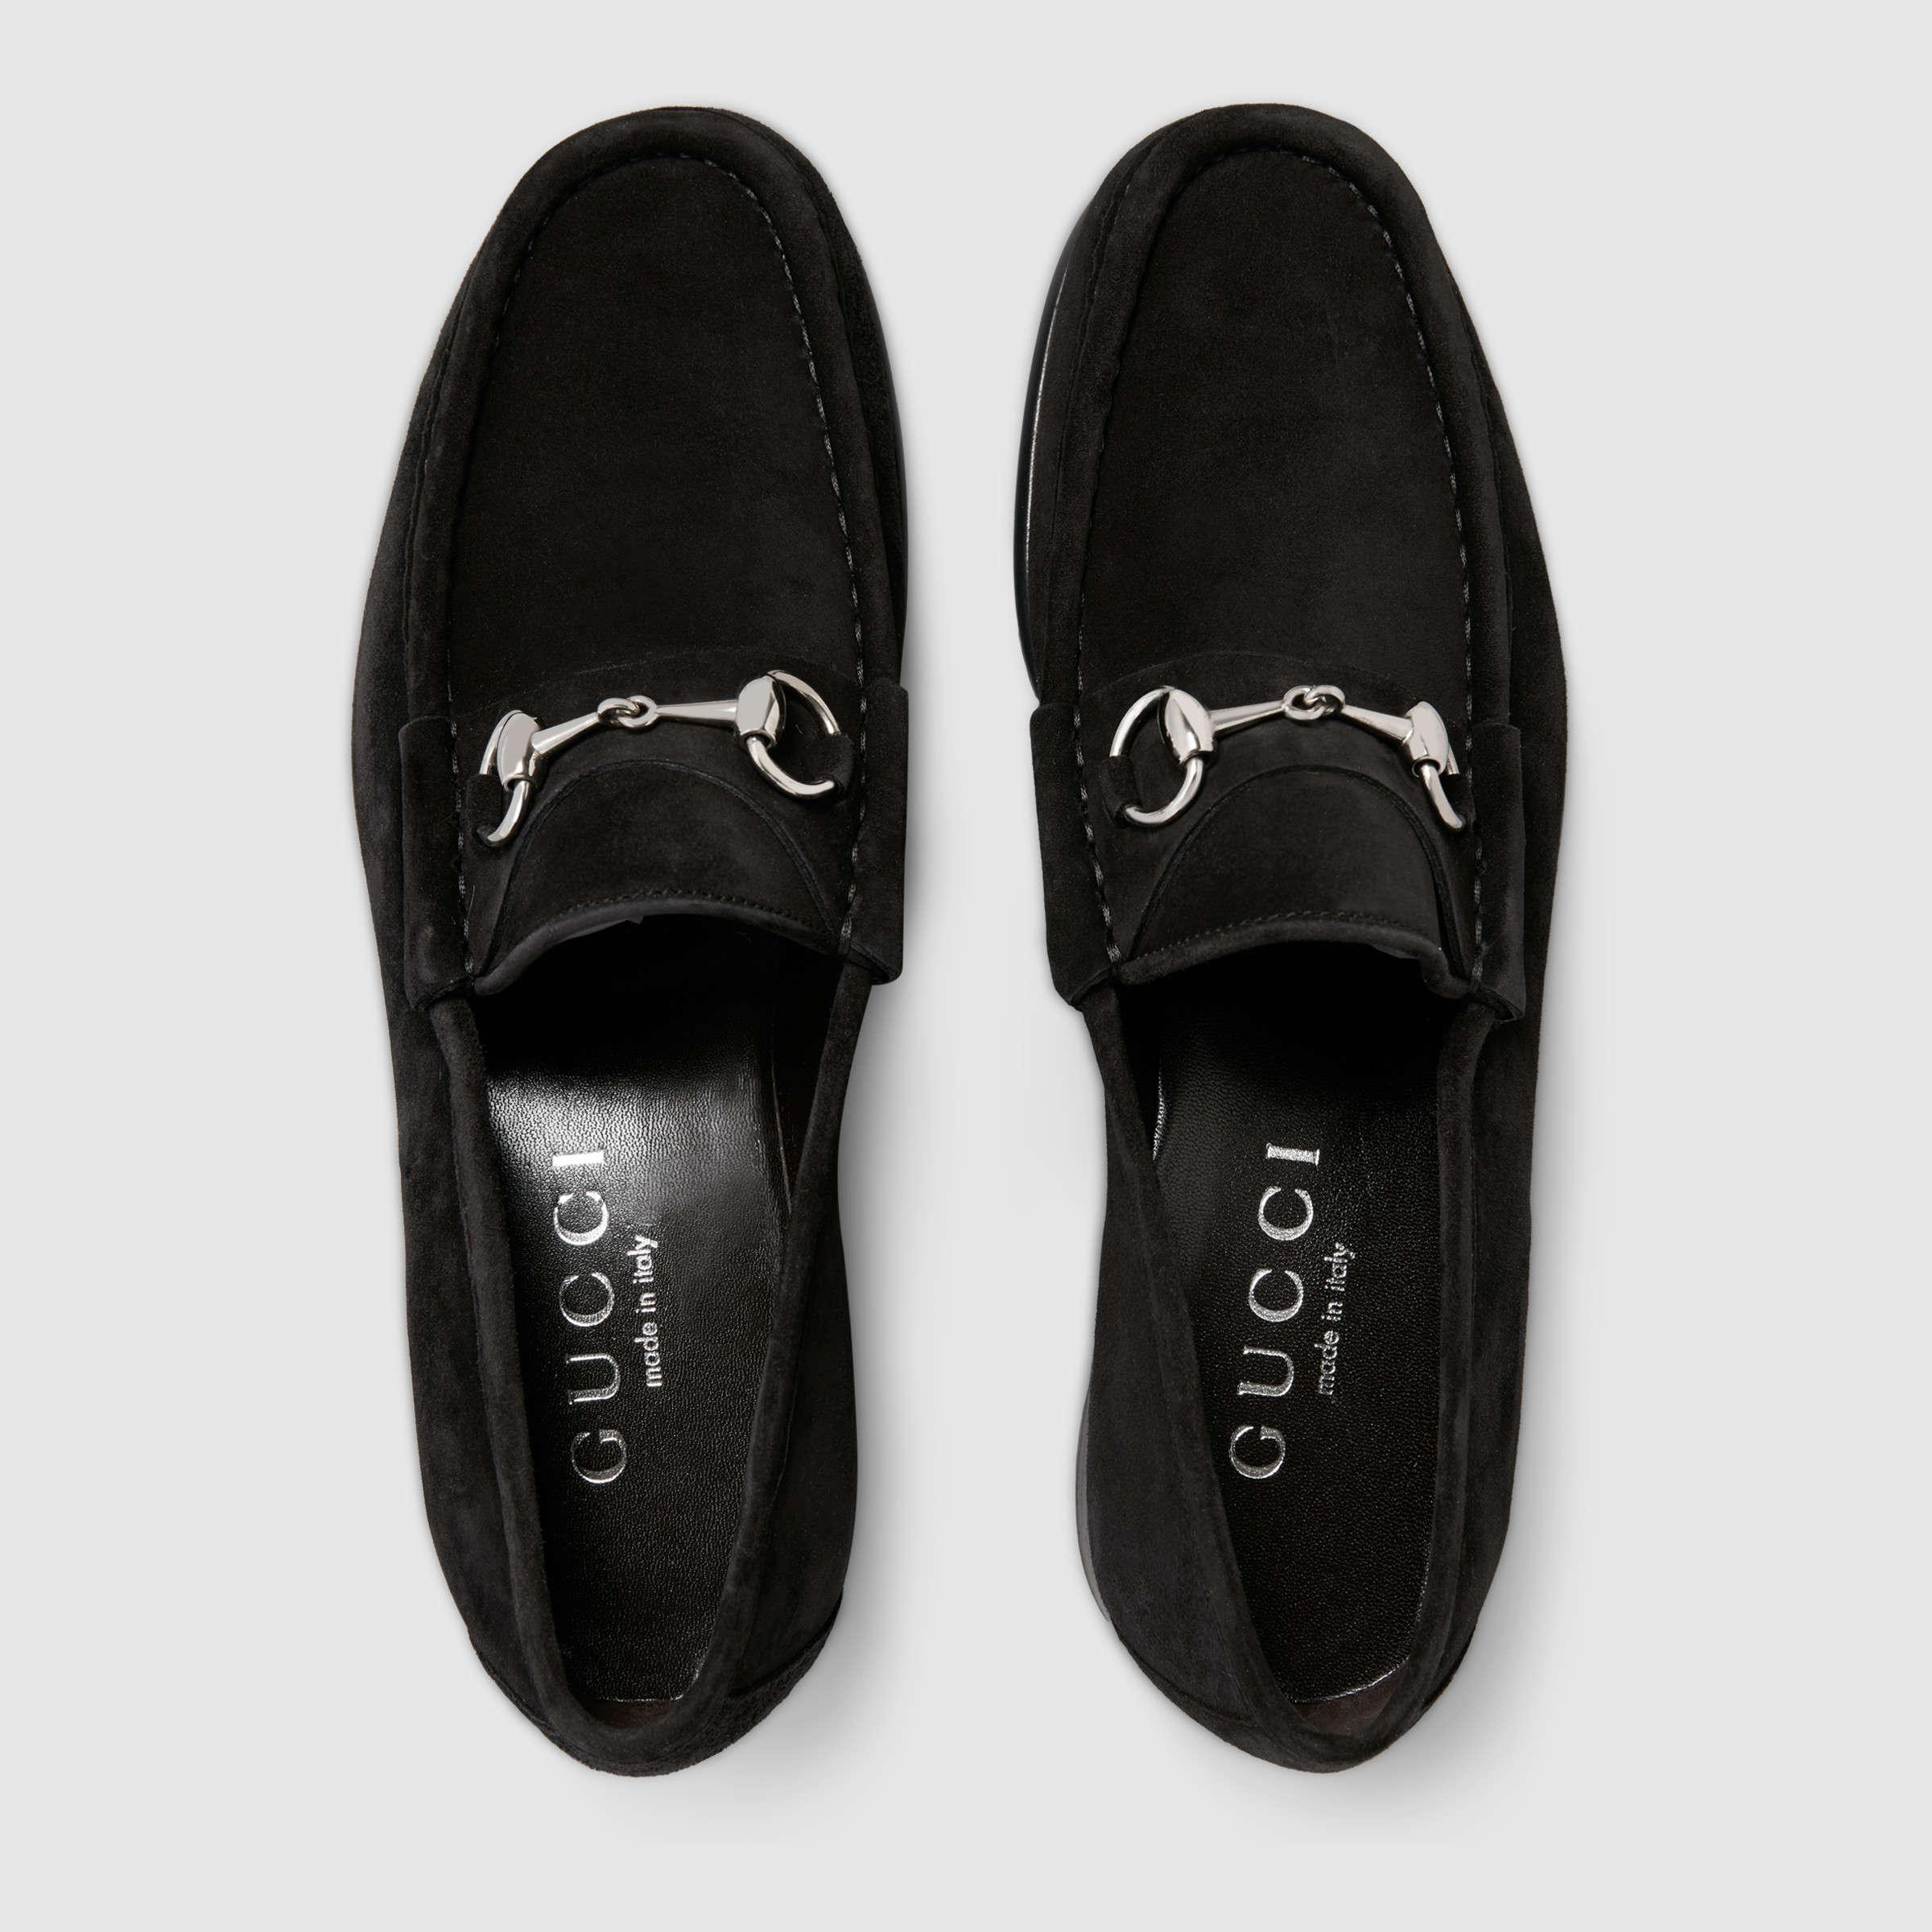 ebc3108a7ac Gucci Horsebit Suede Loafer in Black for Men